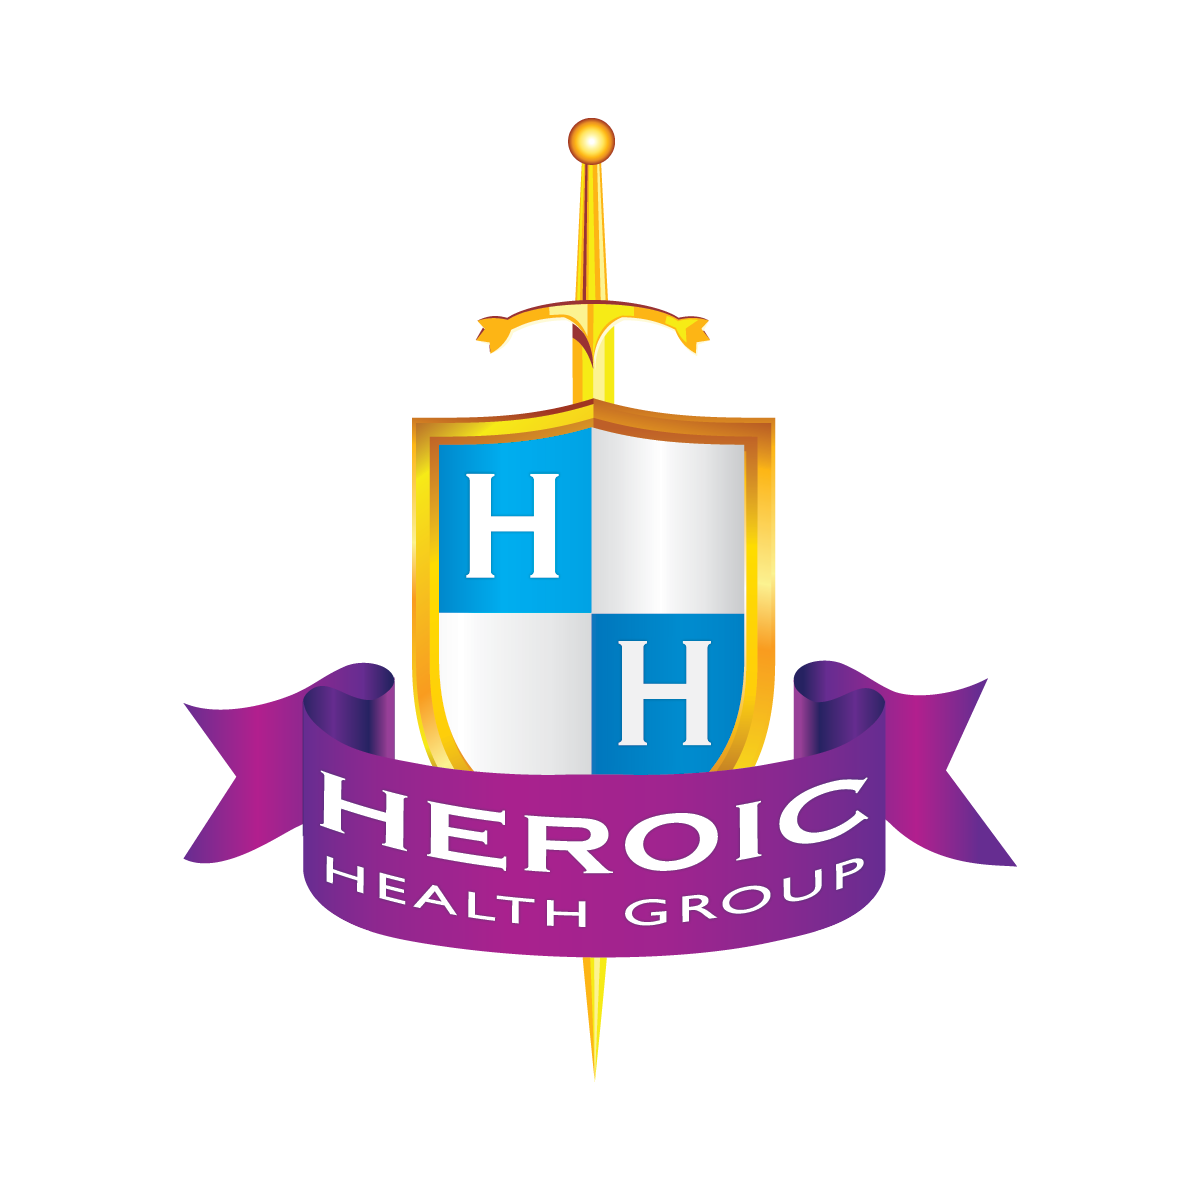 Heroic Health Group, LLC